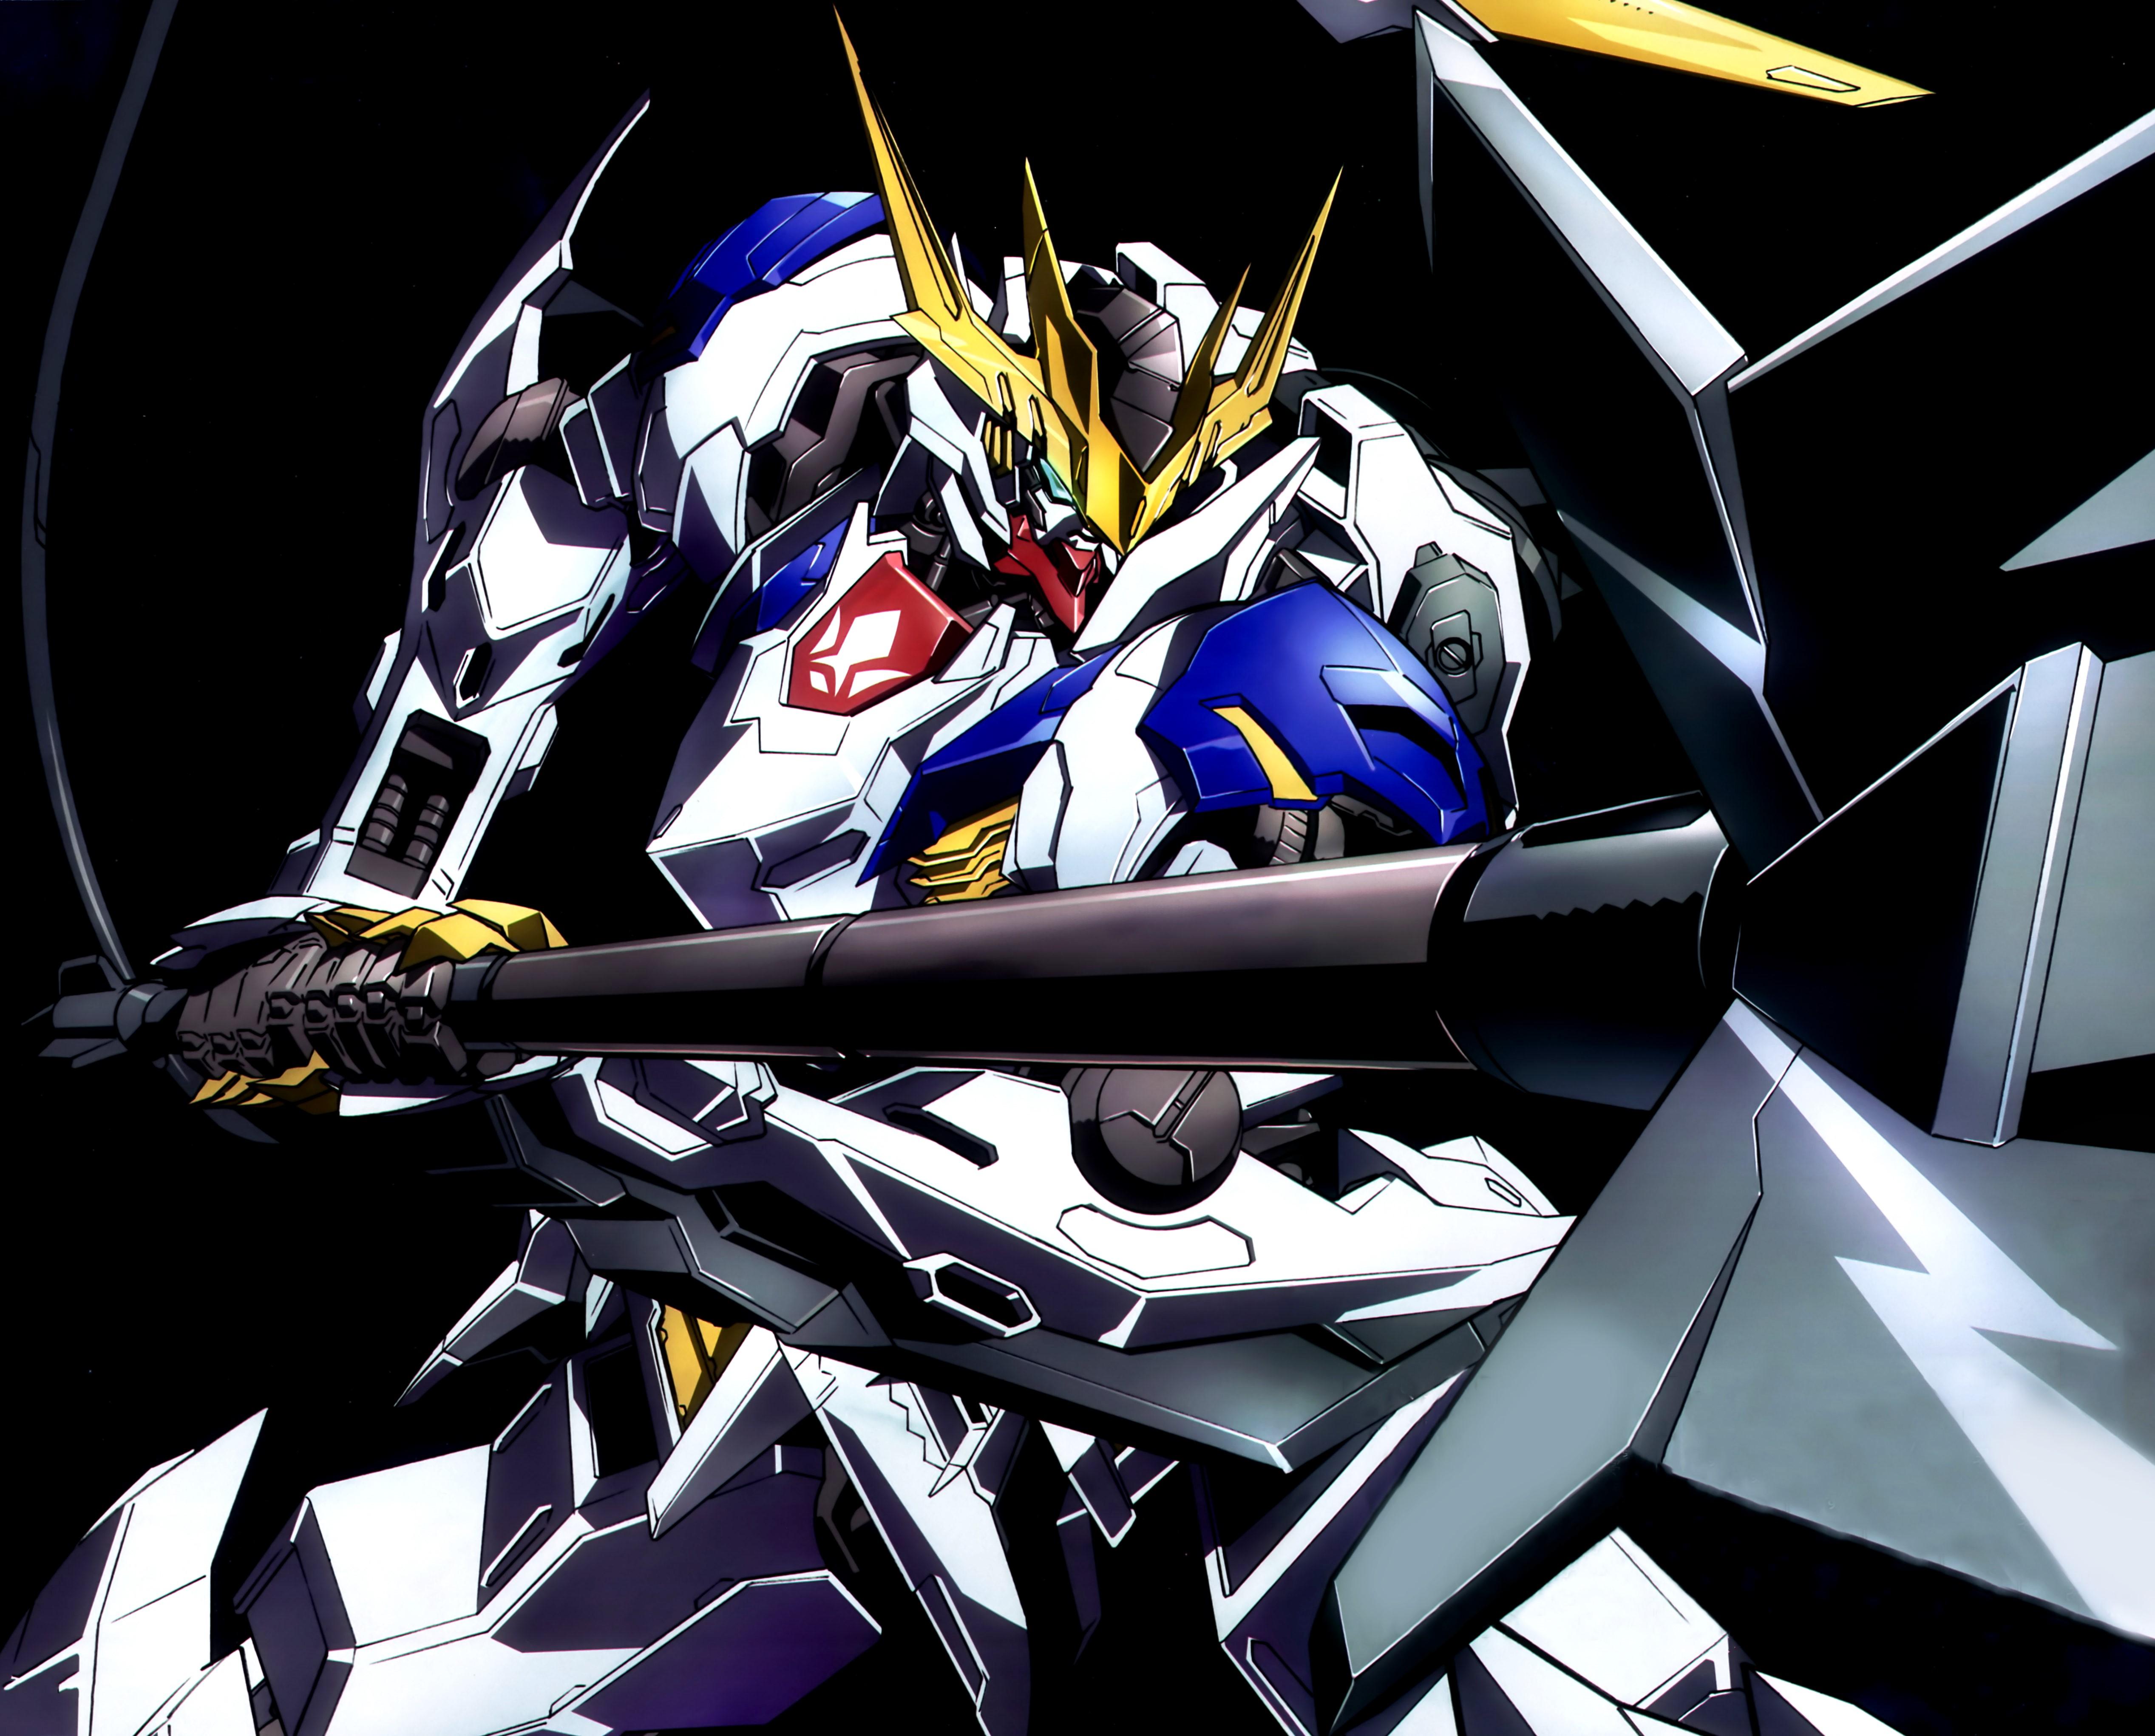 Mobile Suit Gundam 4k Ultra HD Wallpaper   Background ...